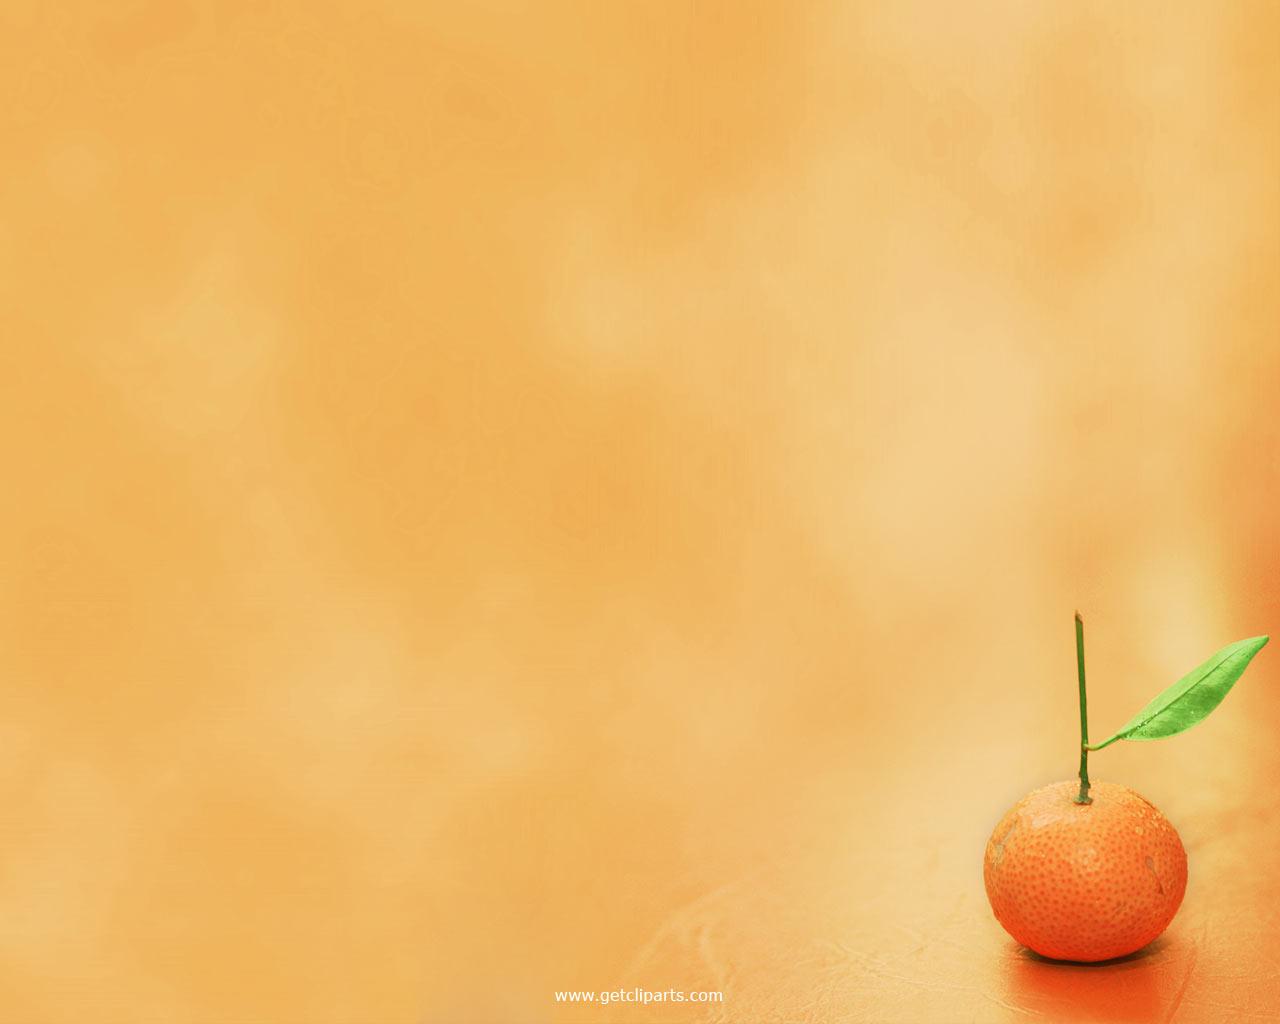 Background image 800x600 - Background Fruit Orange Content Desktop Wallpapers 800x600 Background